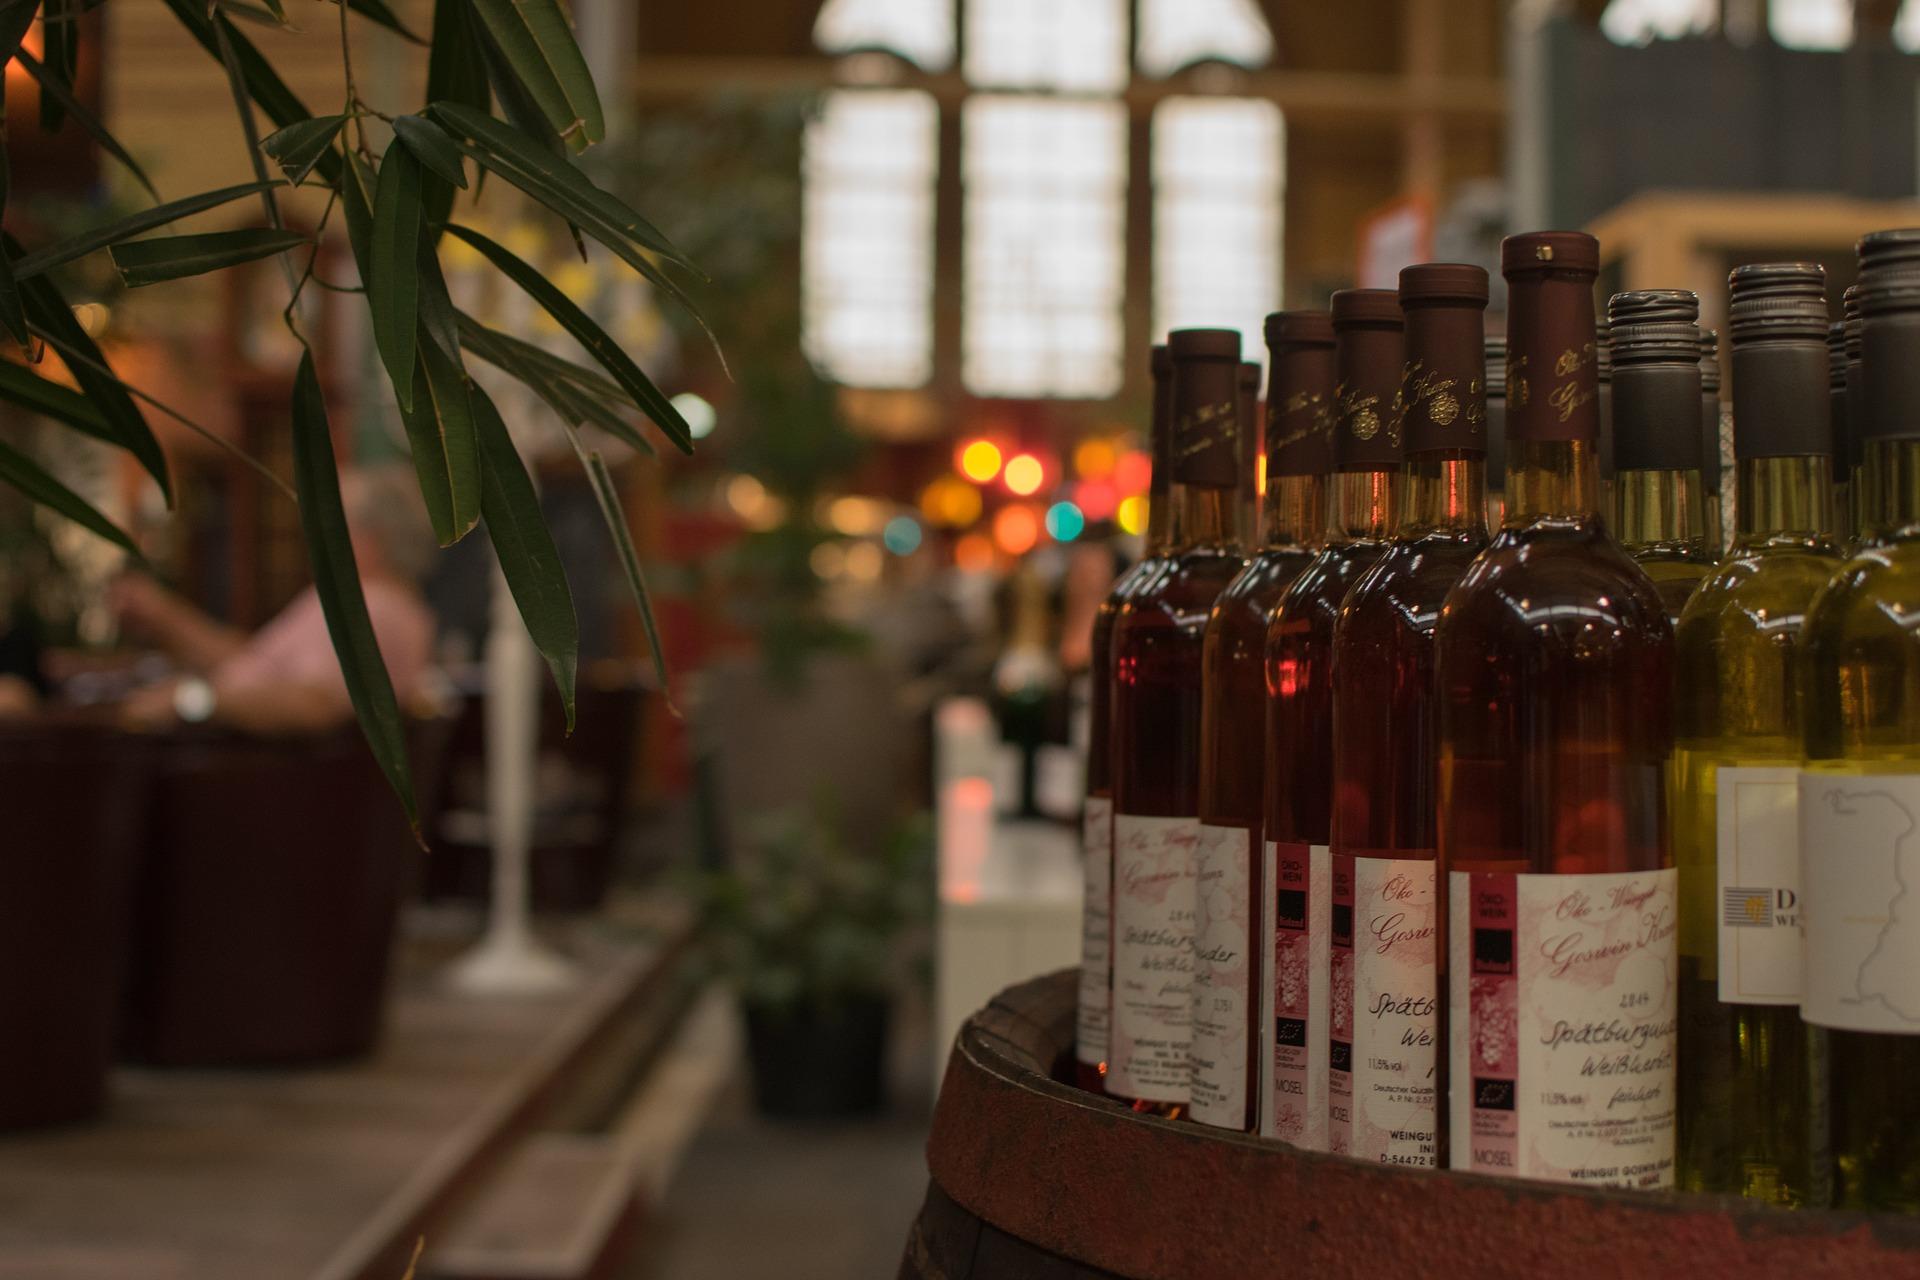 Wine in Barrels